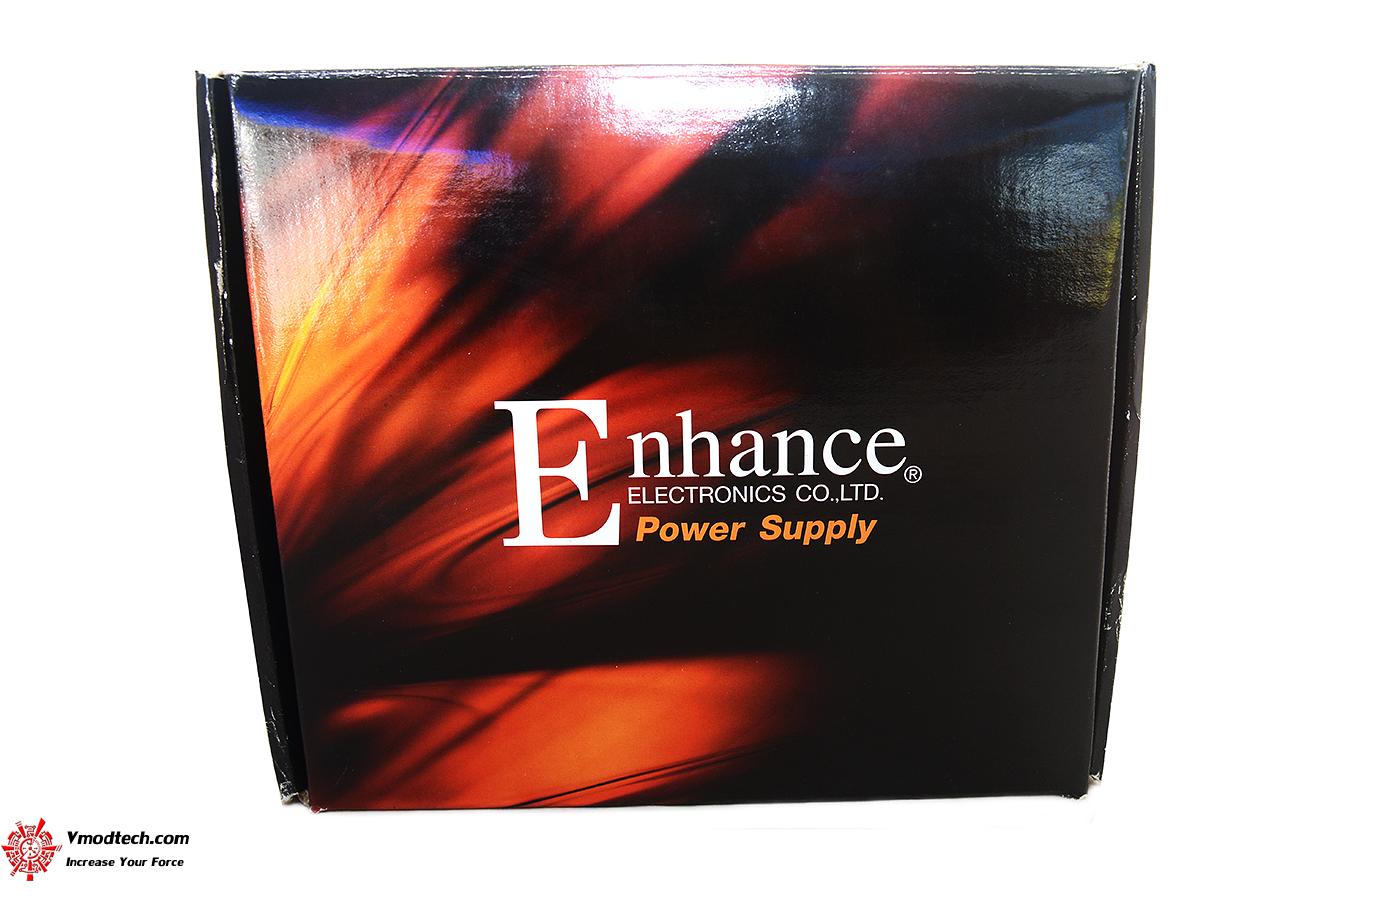 dsc 6970 ENHANCE POWER SUPPLY 1000W EPS 1710 GB1 REVIEW